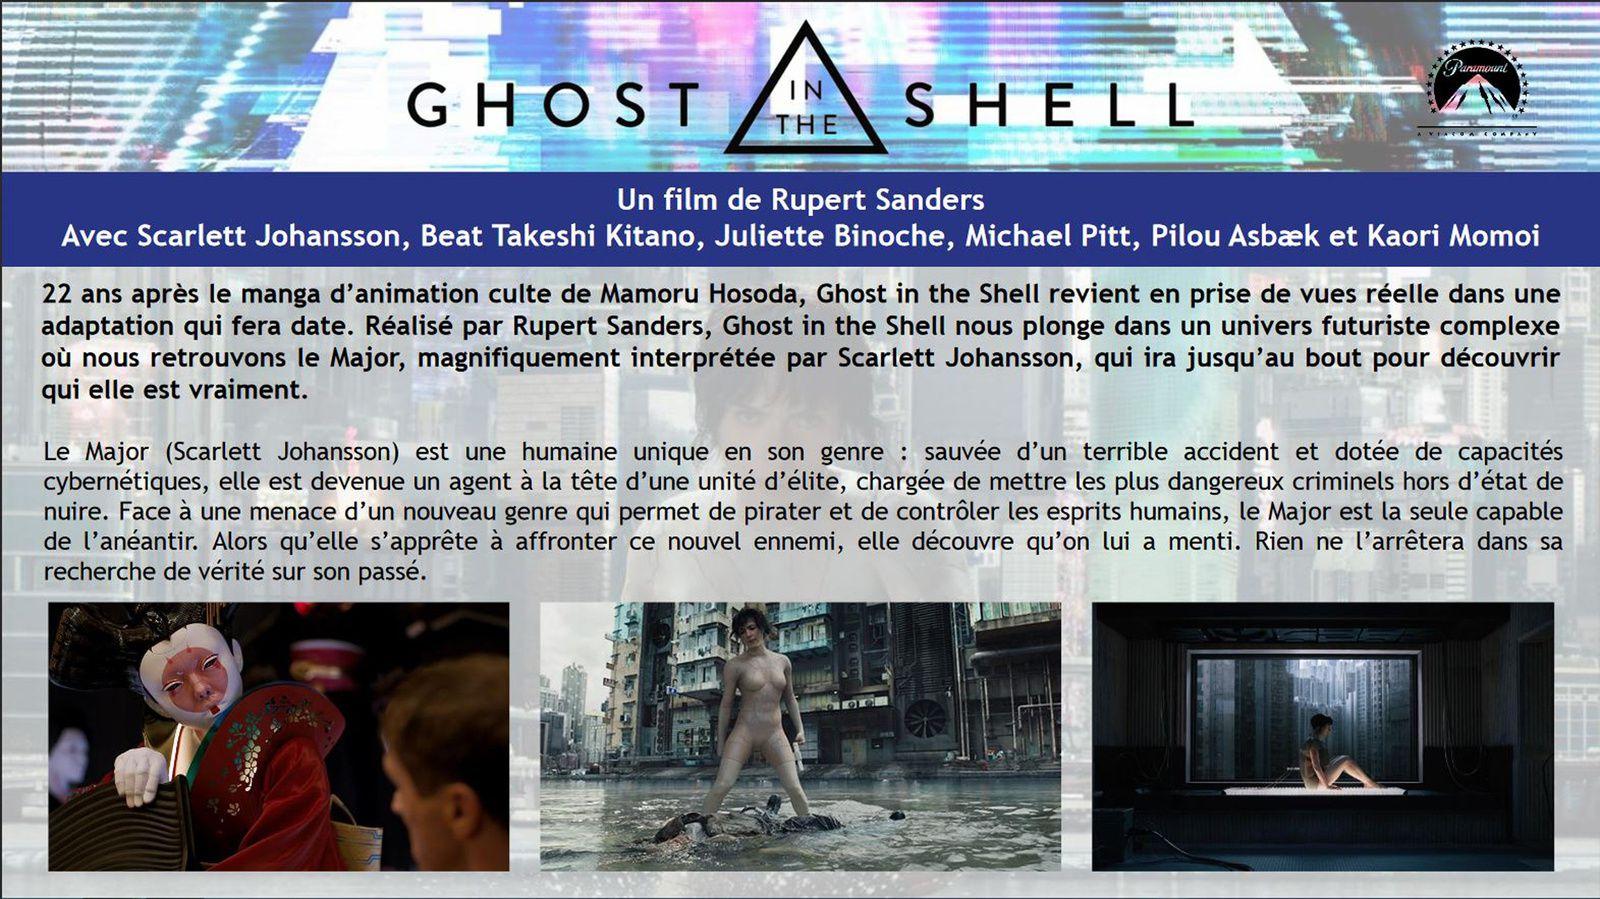 GHOST IN THE SHELL avec Scarlett Johansson, Takeshi Kitano - Sortie vidéo le 31 Juillet 2017